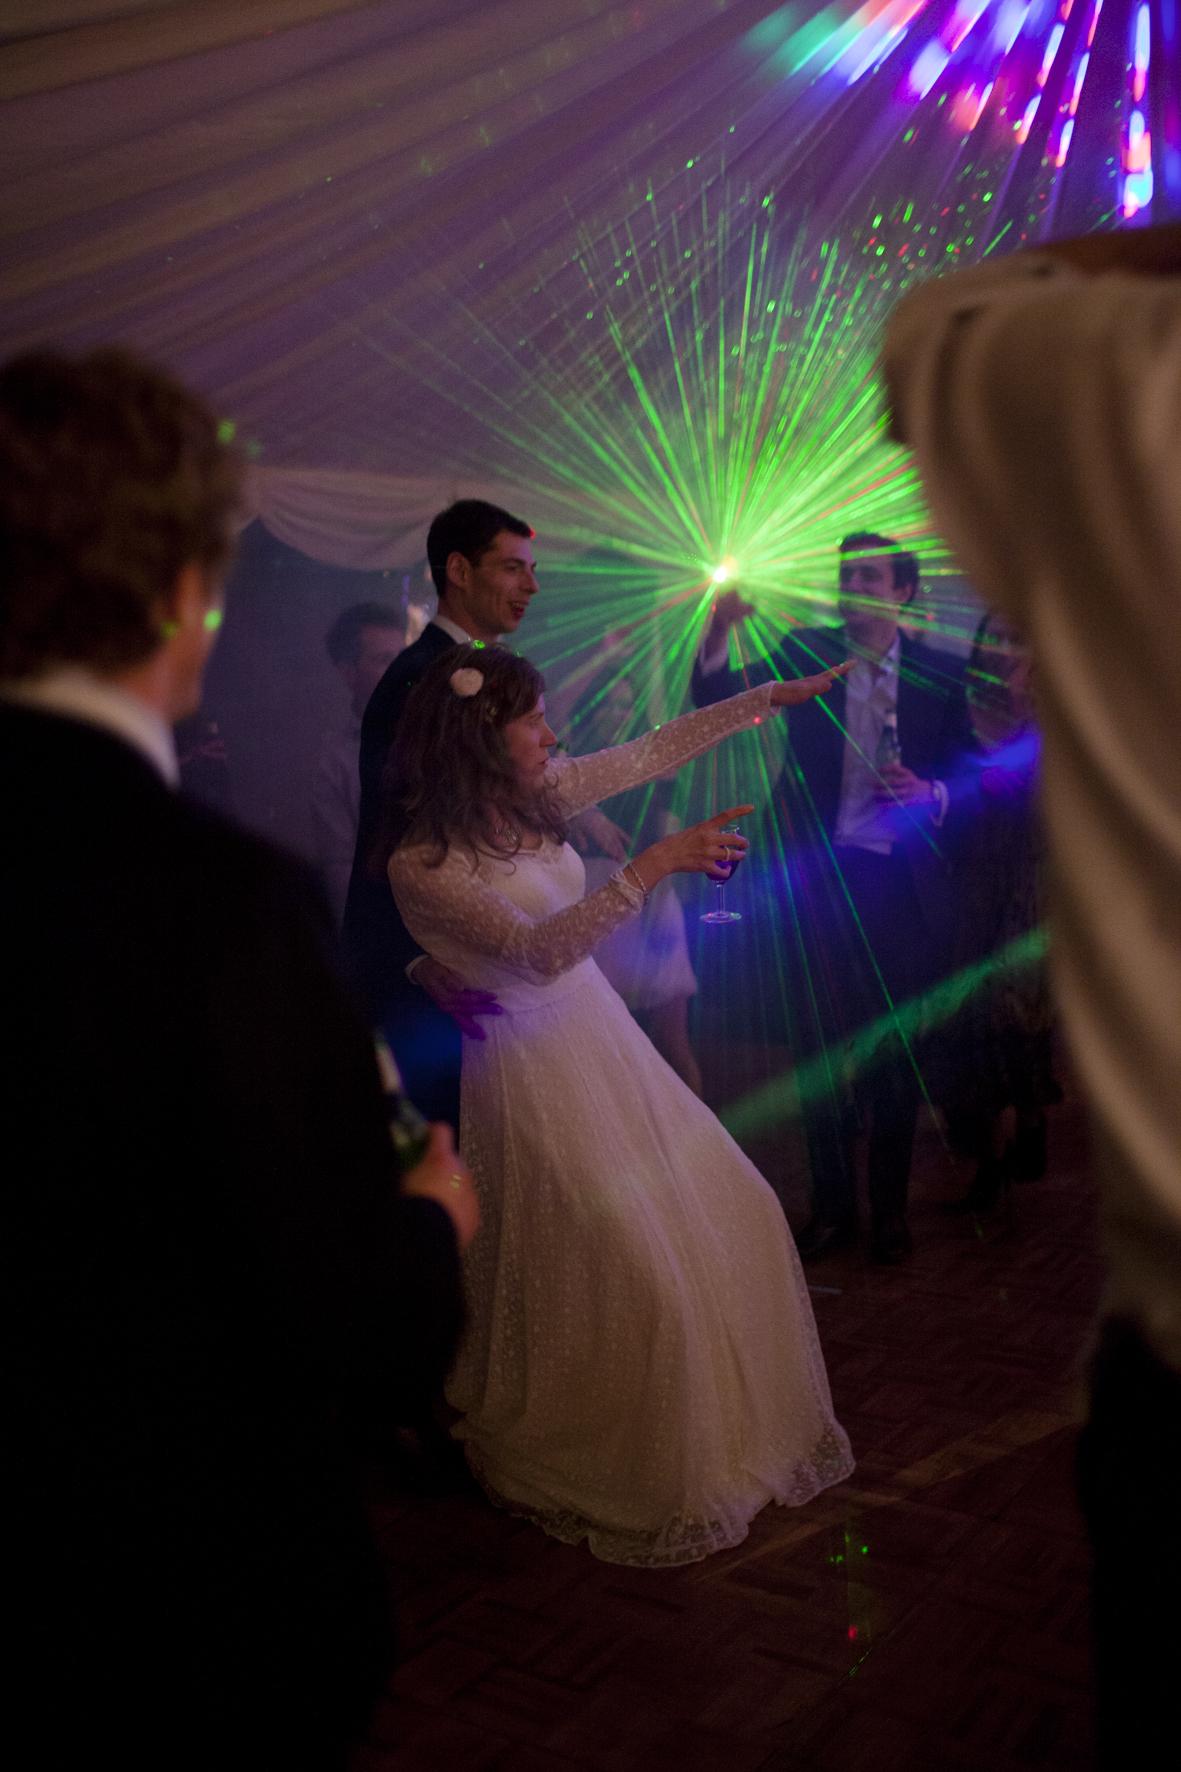 Wedding example_M&P__MG_4520_Claudia Leisinger.jpg